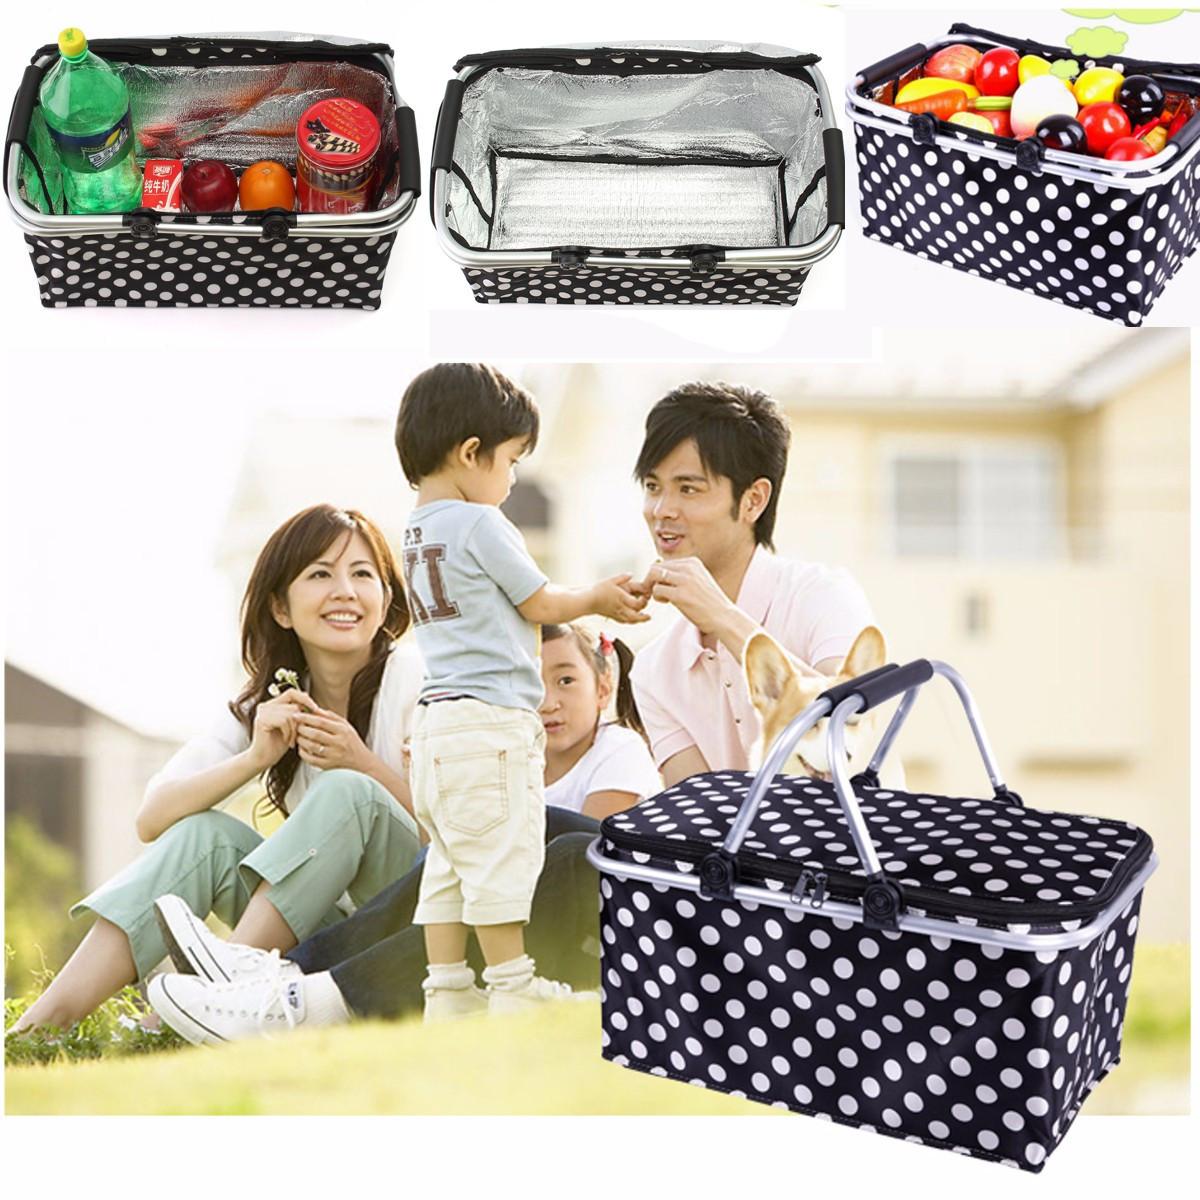 30l sac isotherme valise panier pique nique voyage camping pliable achat vente sac gouter. Black Bedroom Furniture Sets. Home Design Ideas